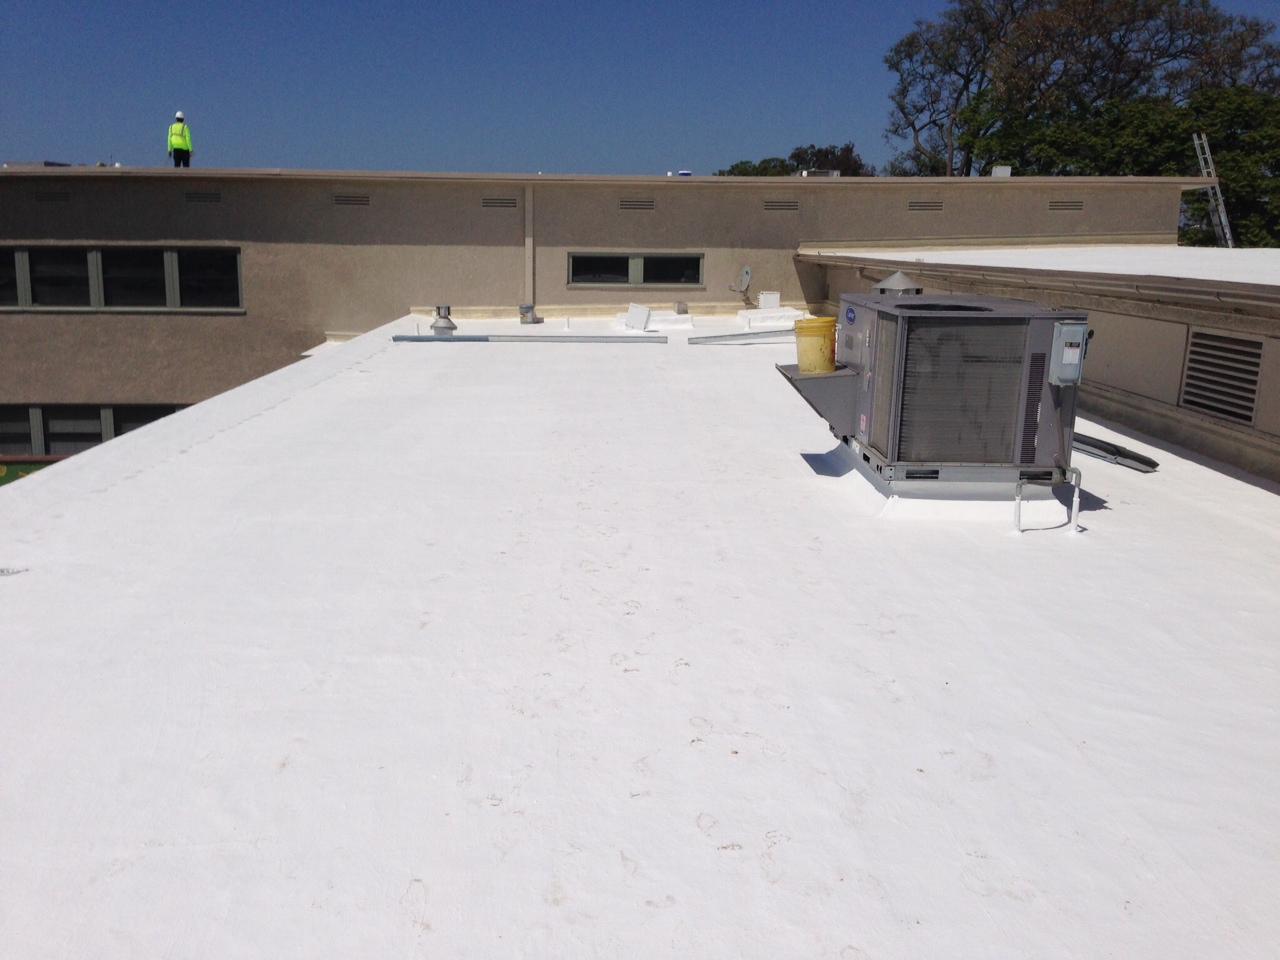 hvac-unit-roof.JPG